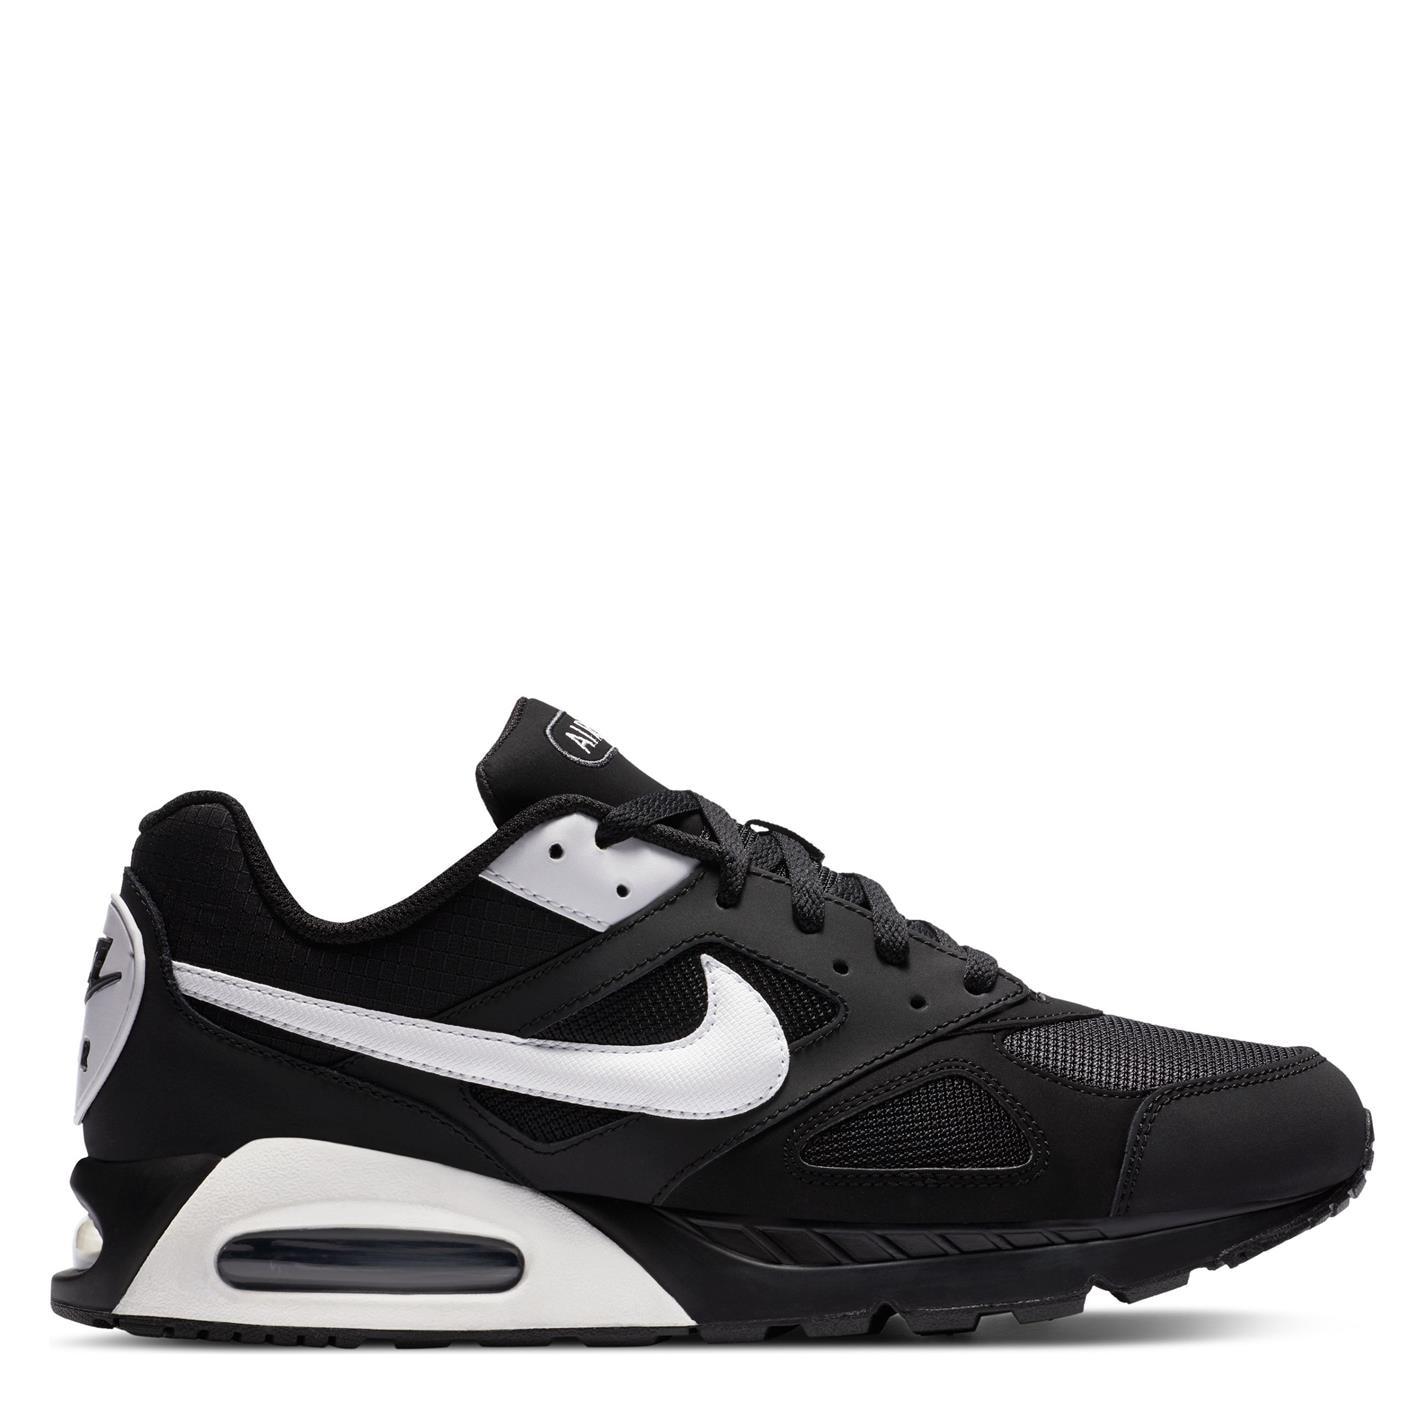 e2e7b271379 Nike Air Max Ivo Mens Black White